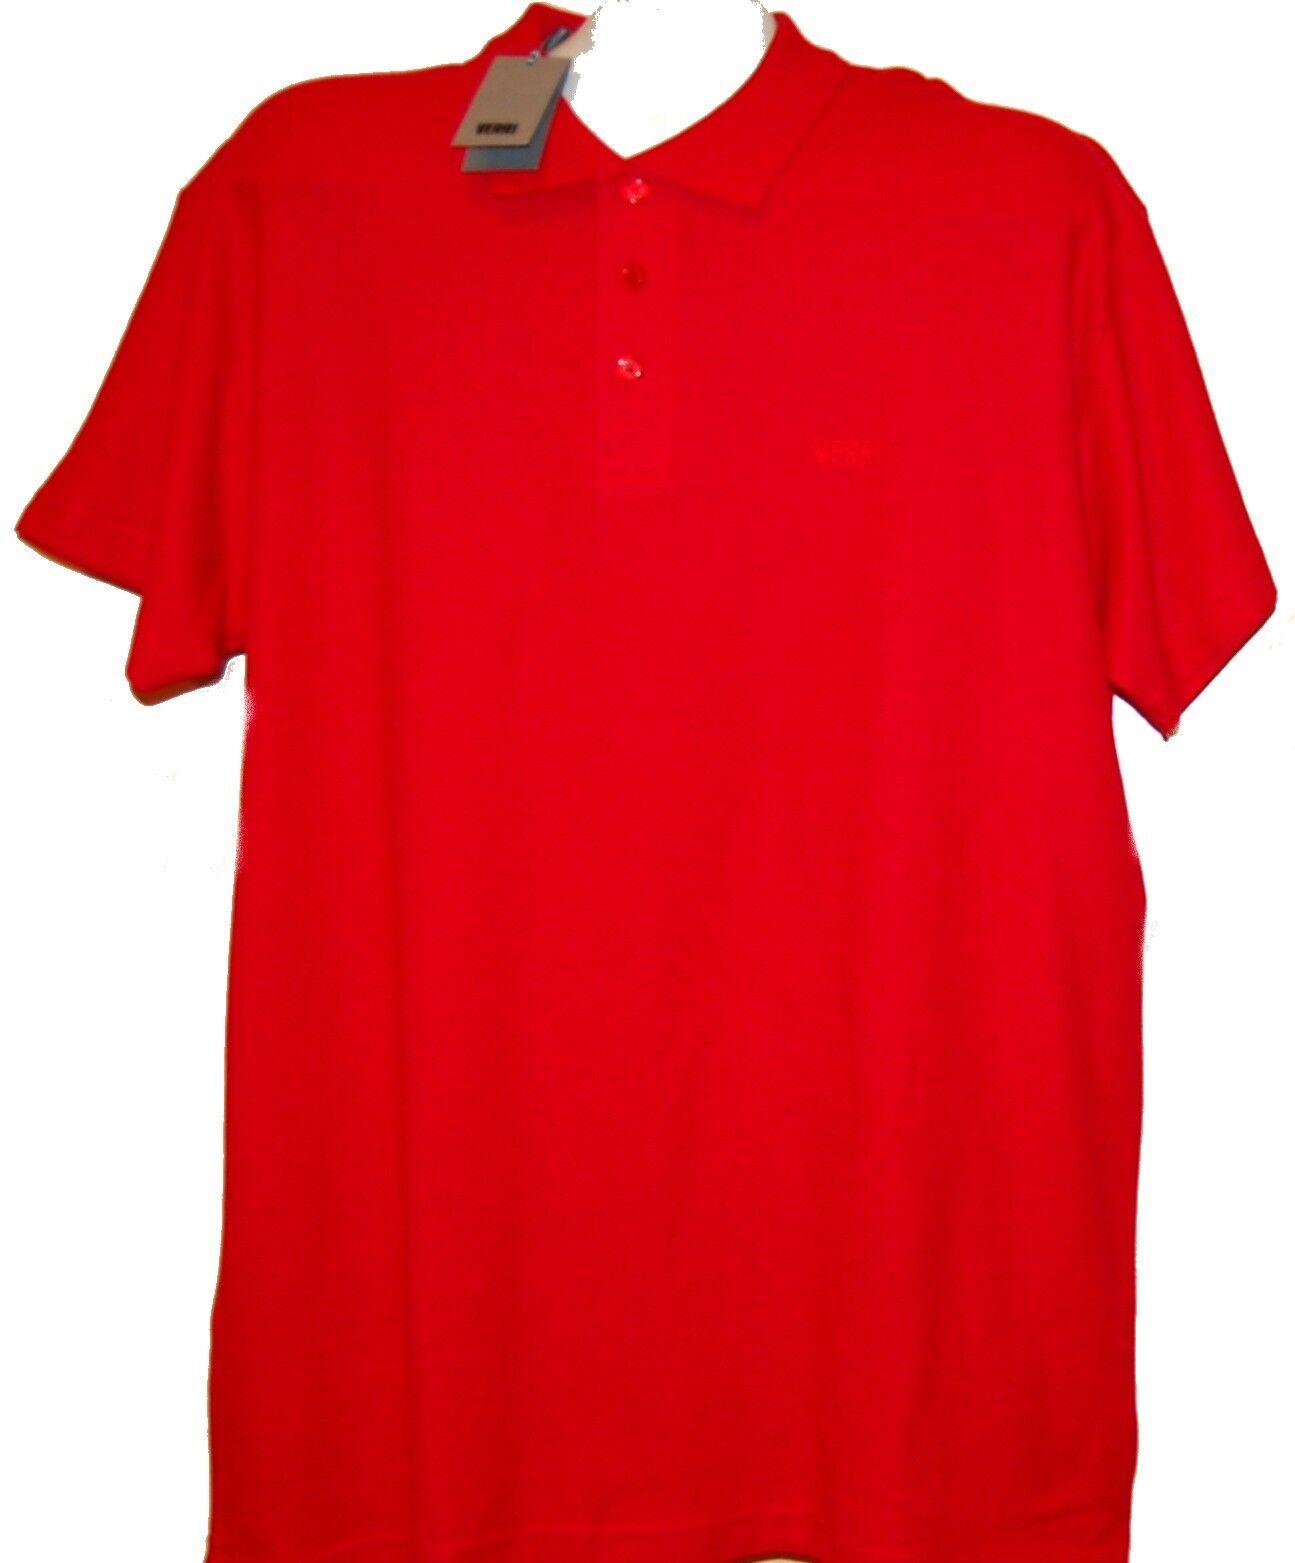 Verri Red  Men's Cotton Polo T-Shirt Size 2XL NEW